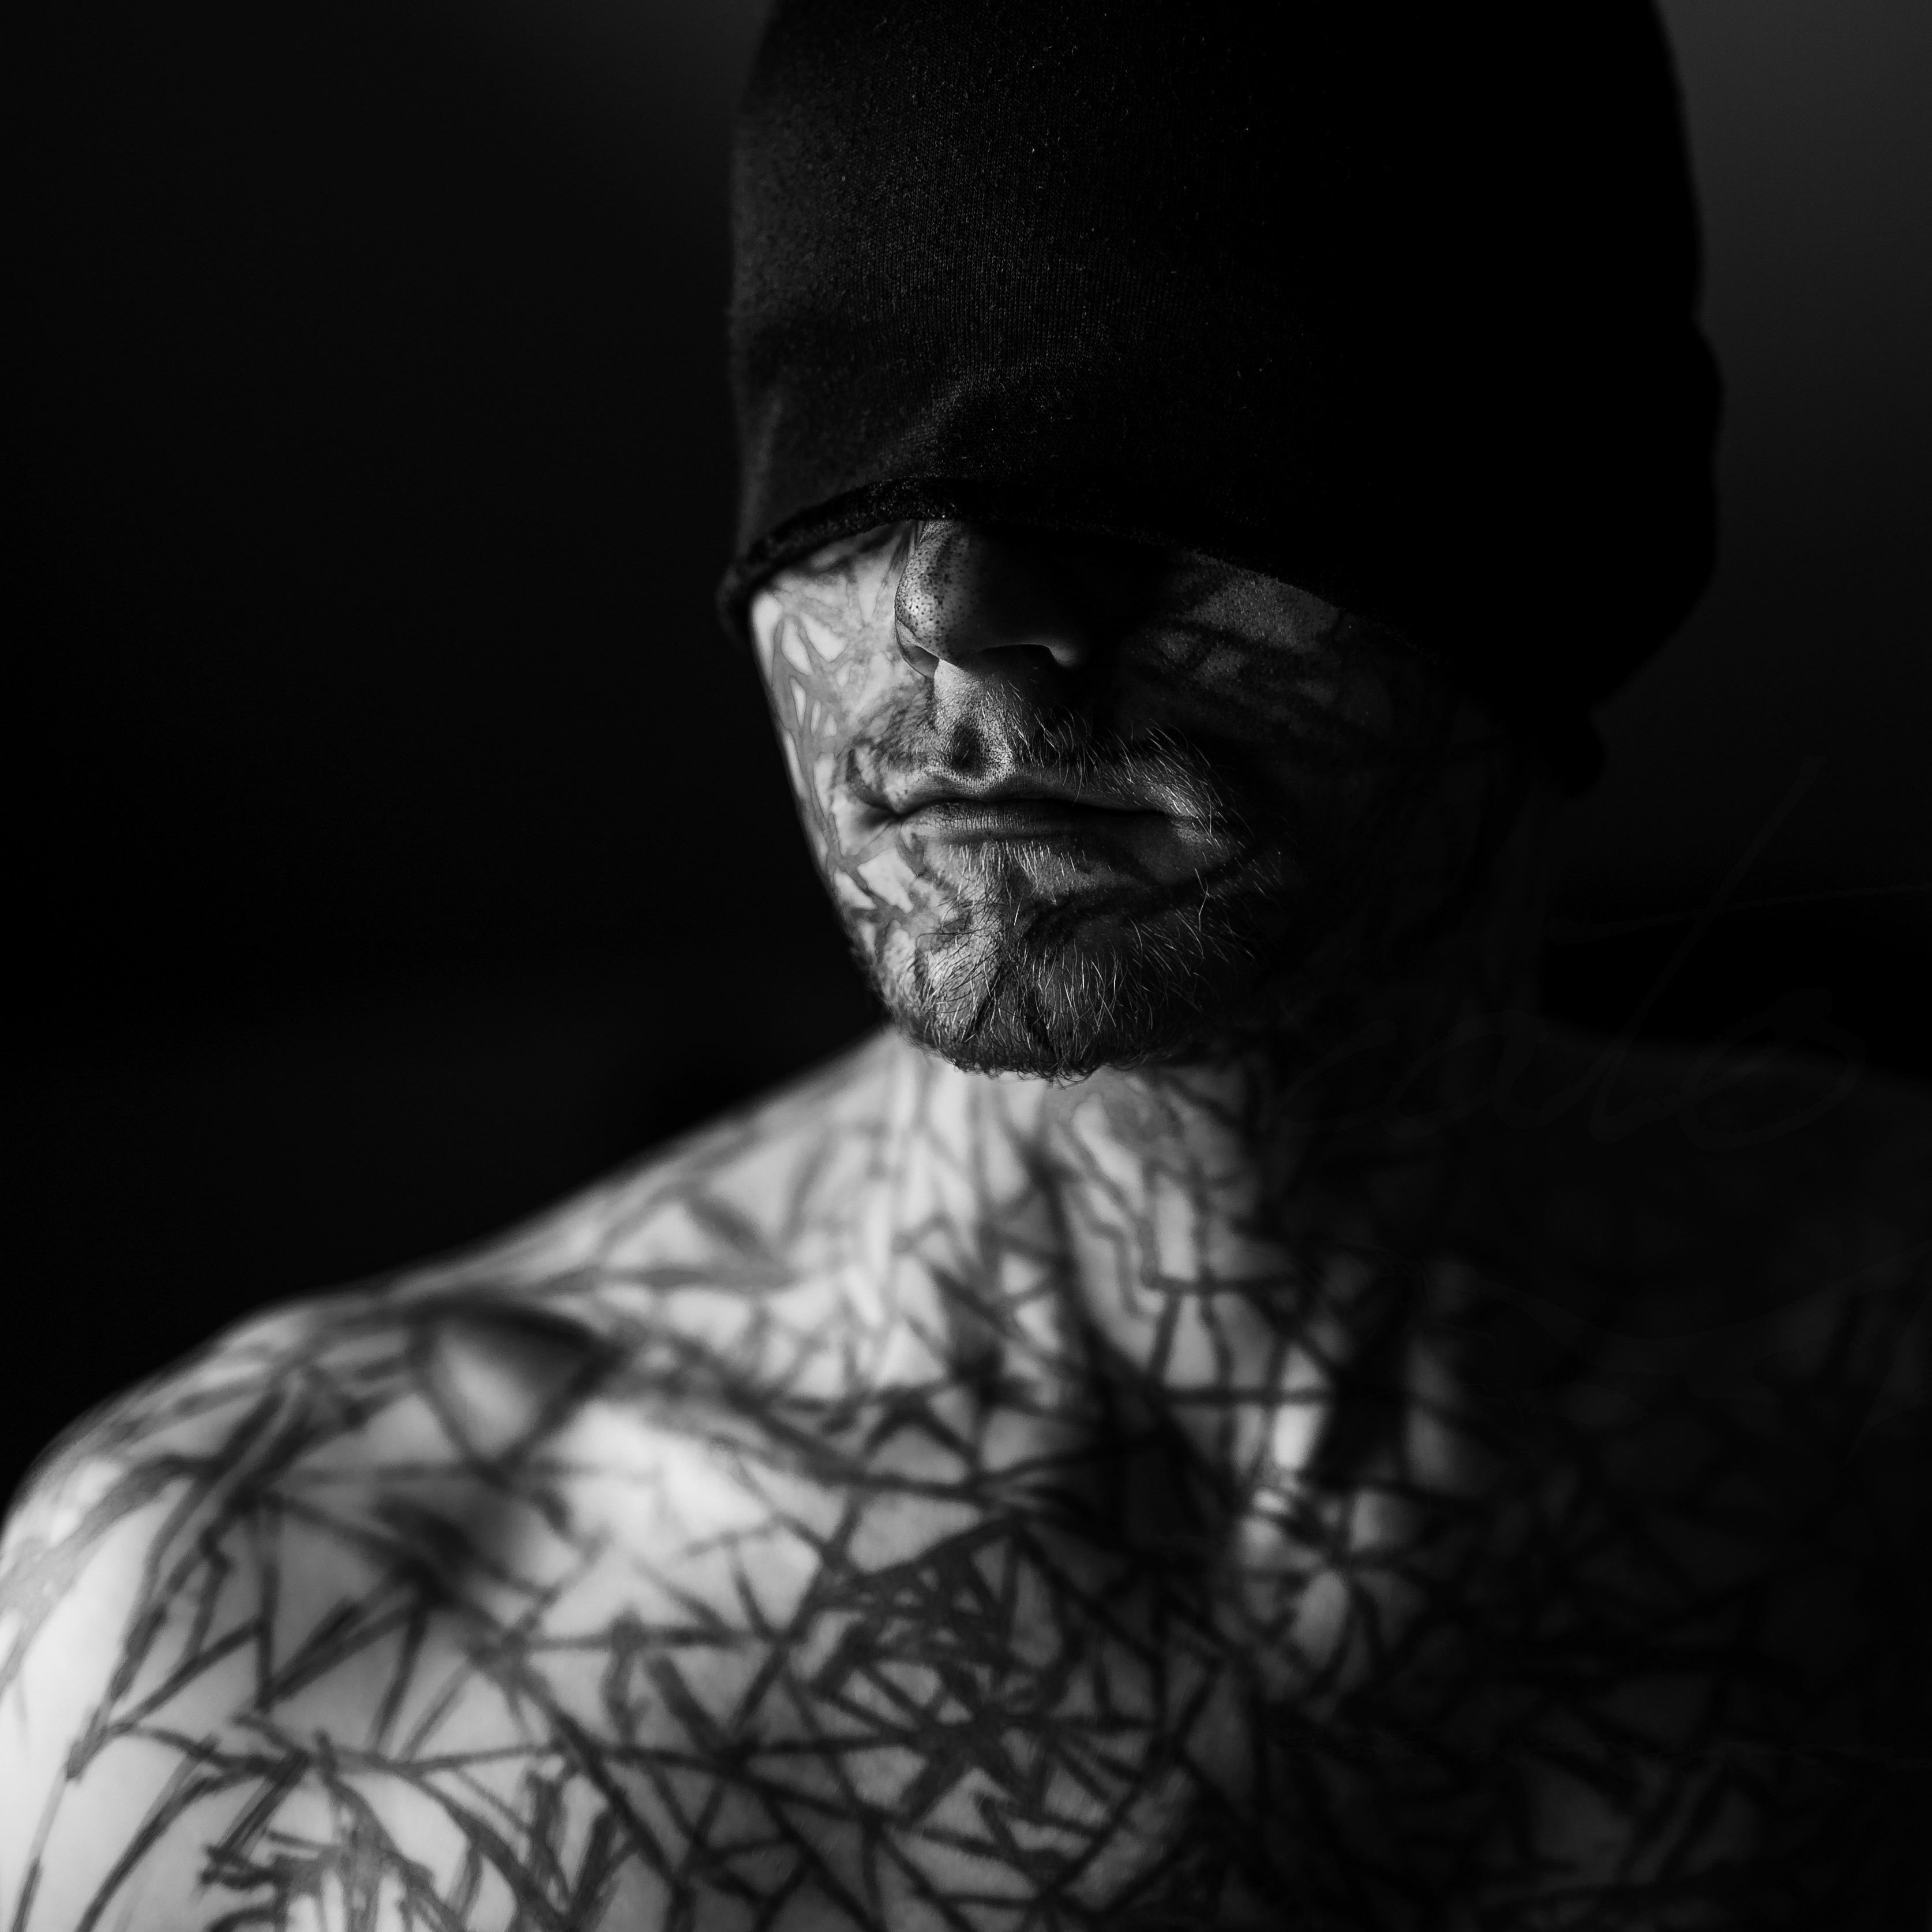 «Svarte netter».Foto: Cato Osaland